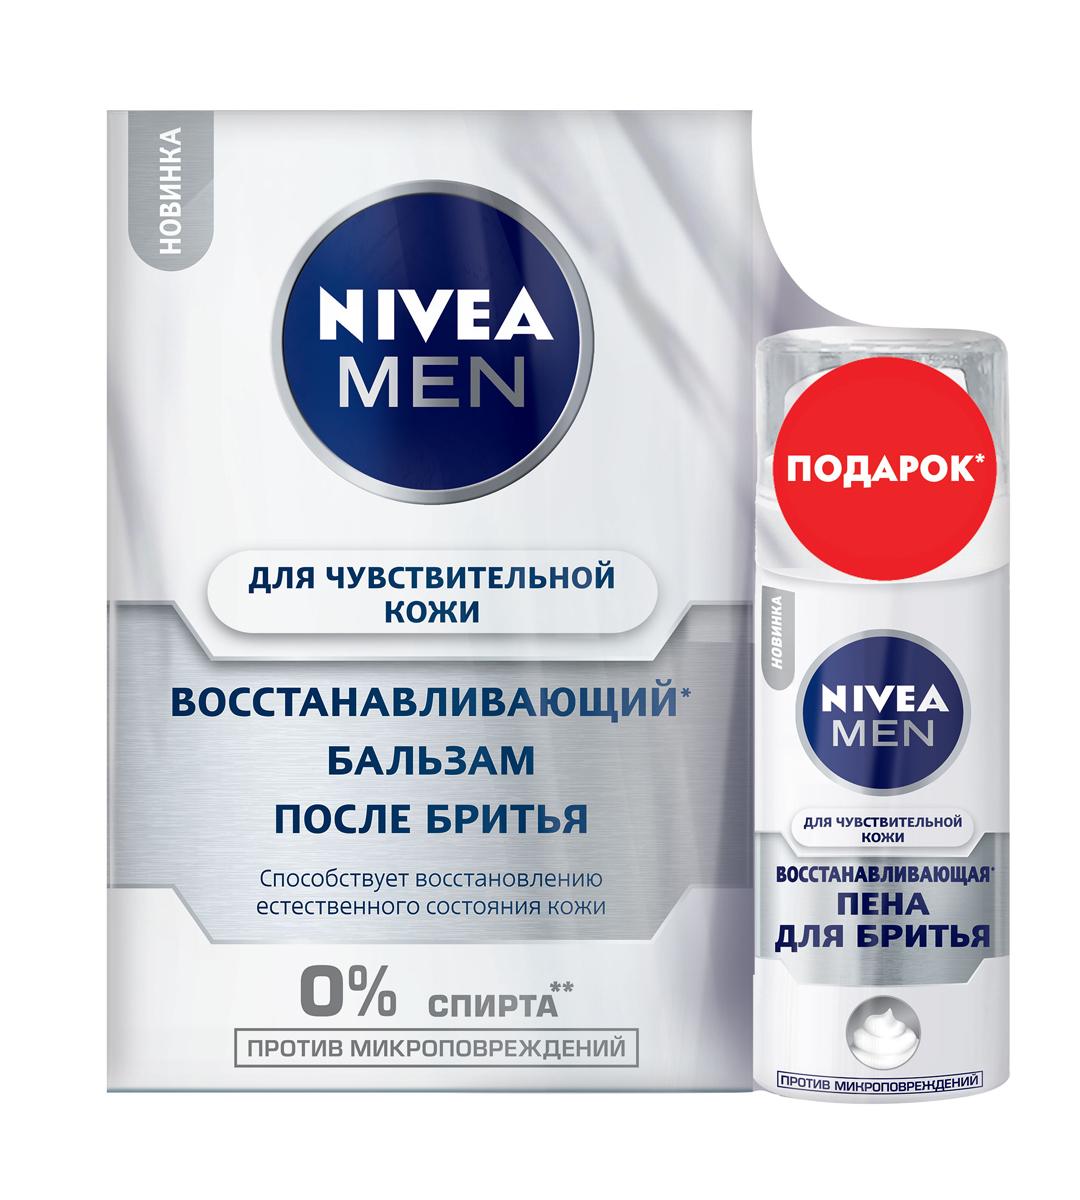 Nivea Бальзам после бритья Восстанавливающий, 100 мл+Мини пена Восстанавливающая, 35мл - Мужские средства для бритья и уход за бородой